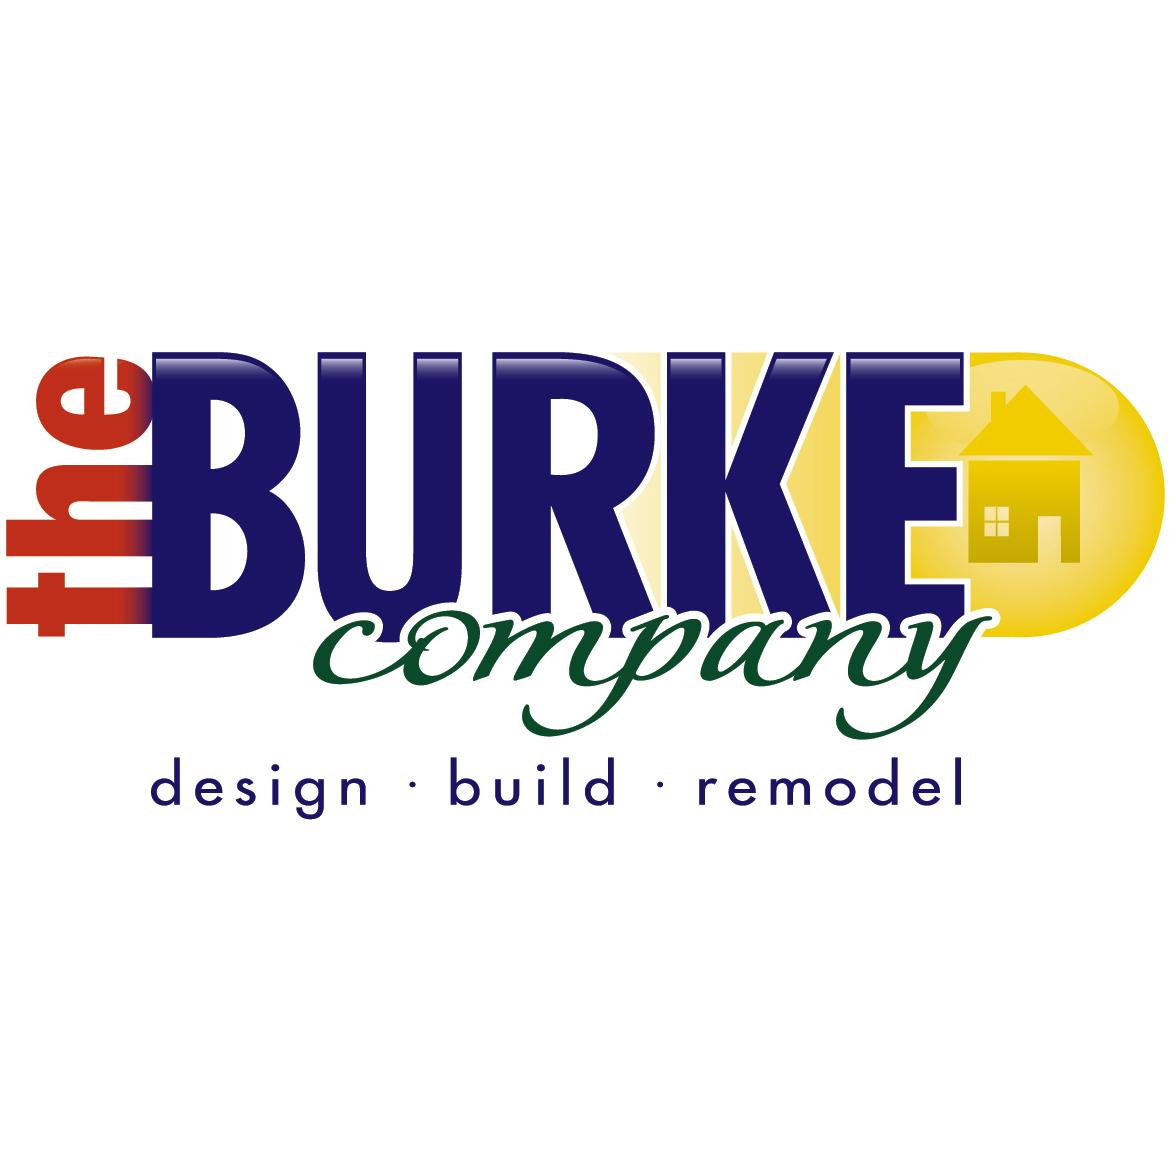 The burke co logo square